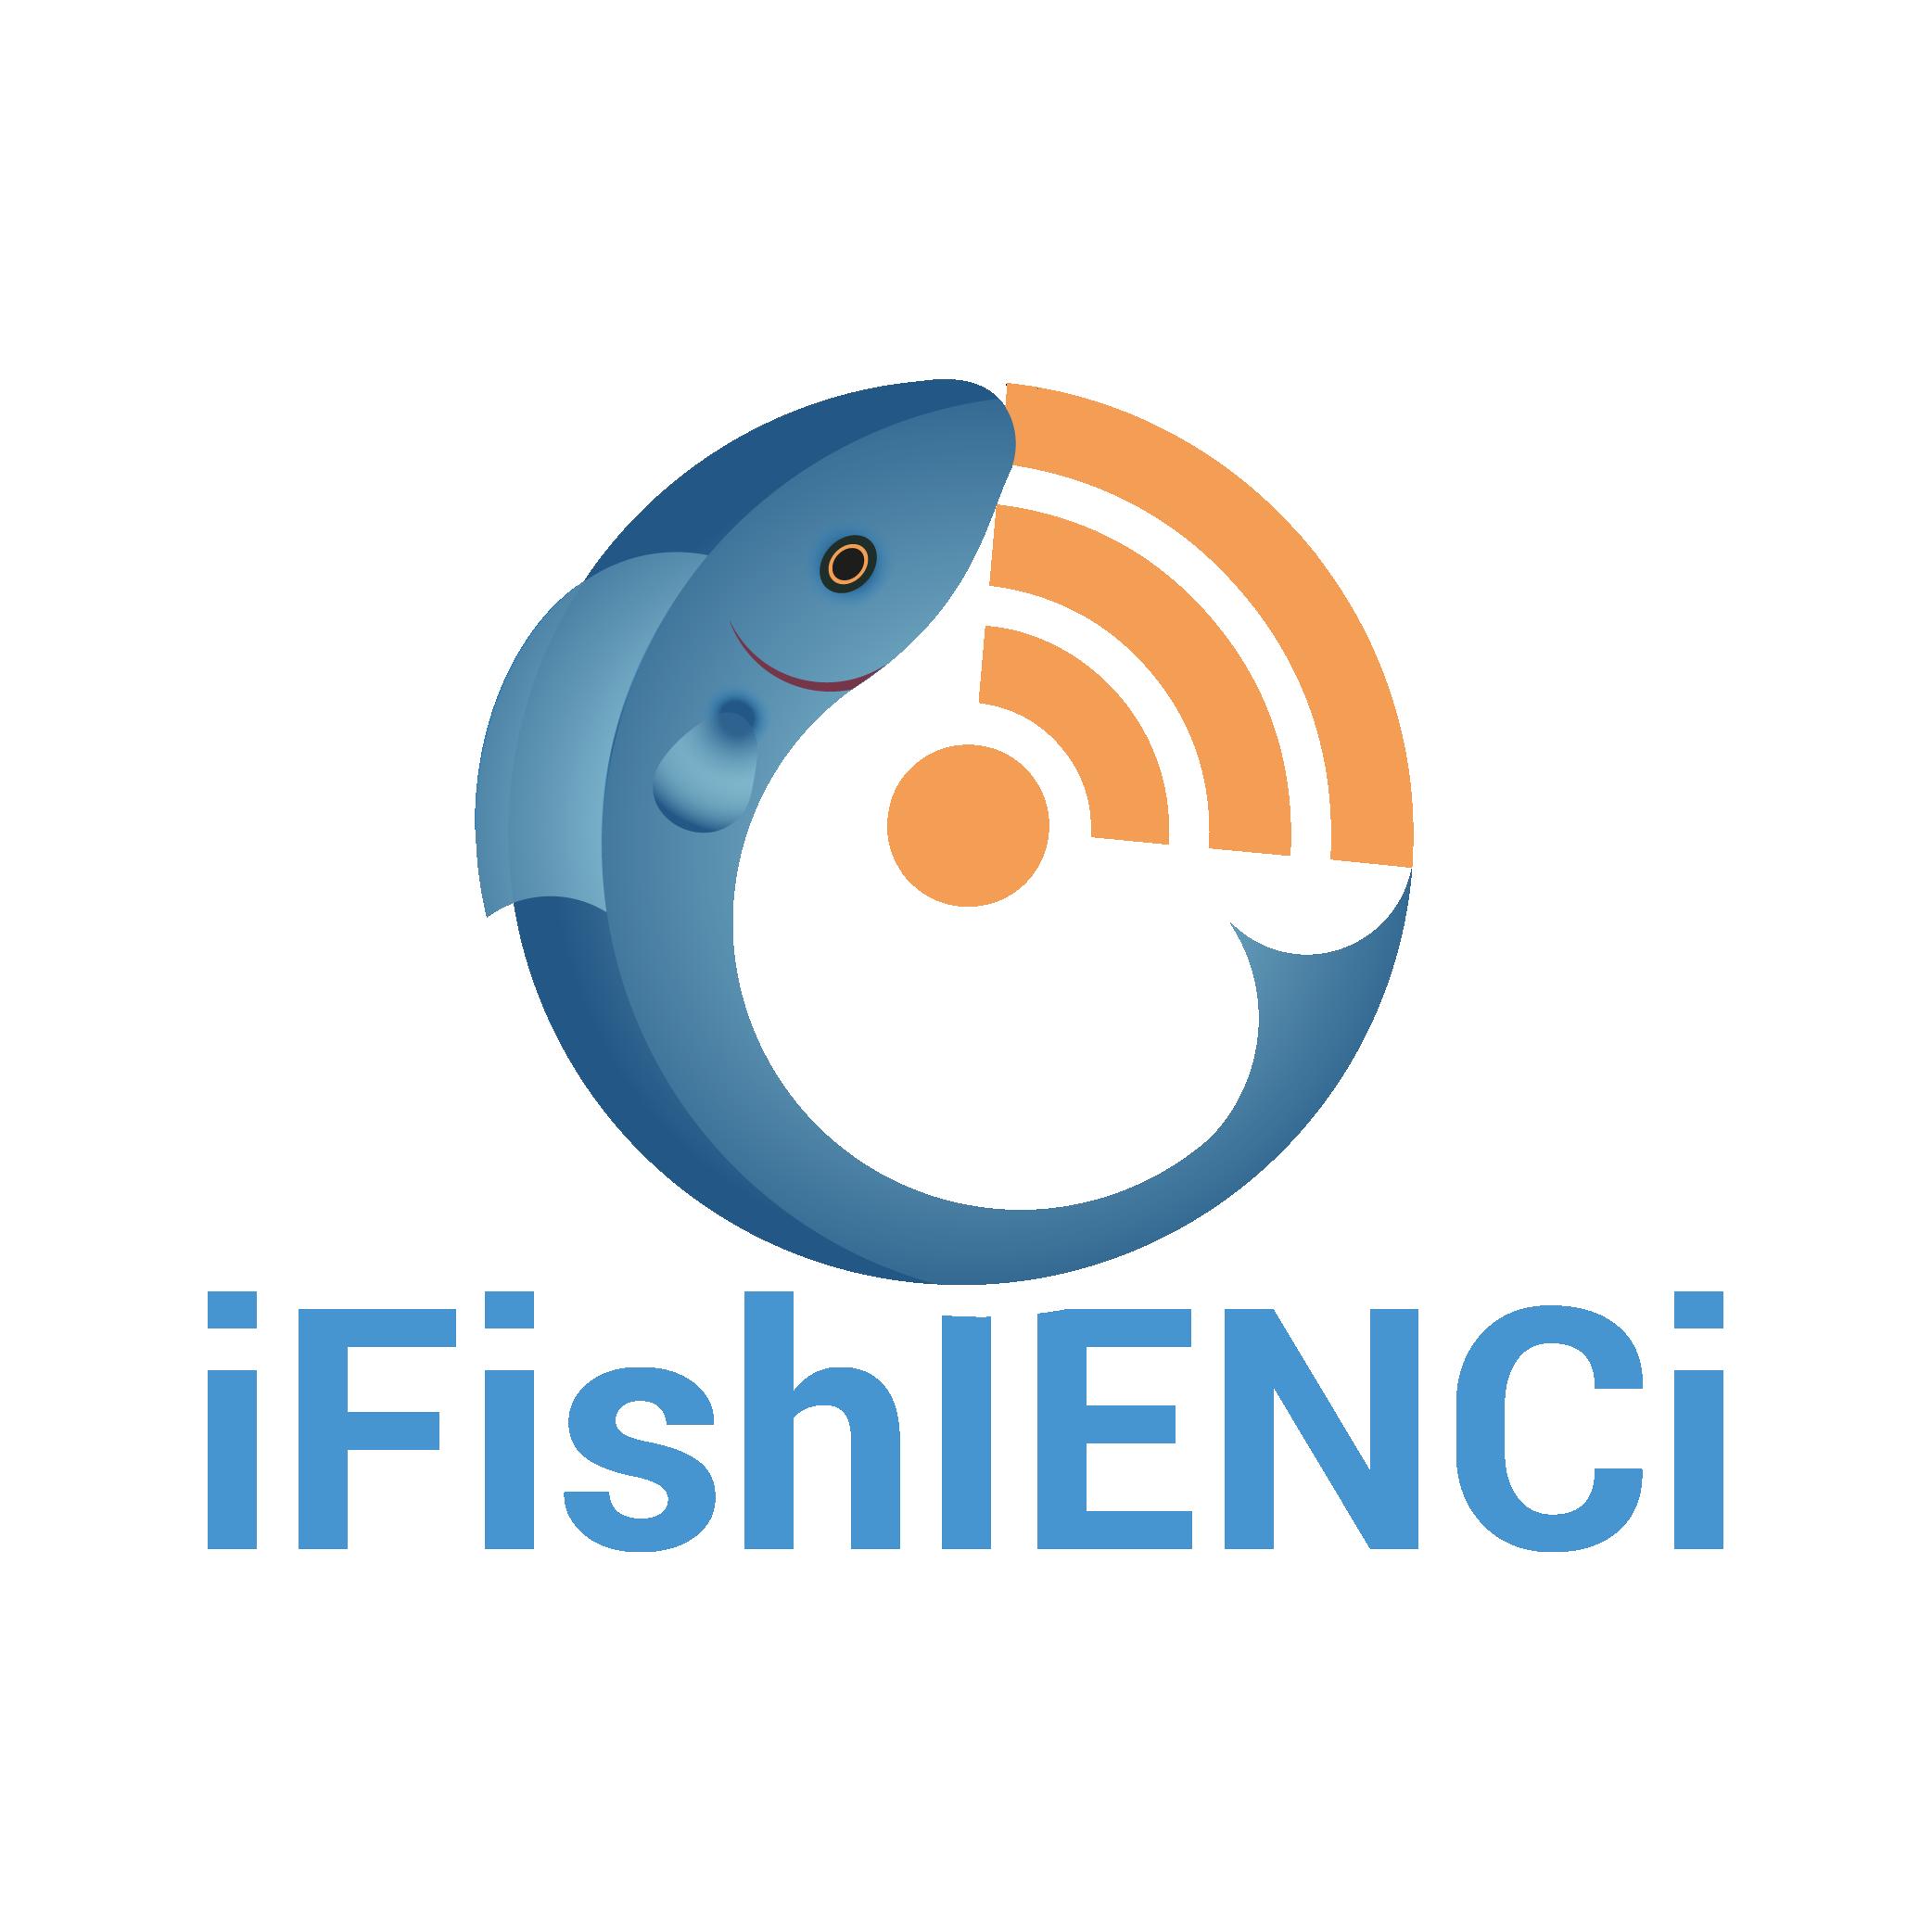 abtgifn01EU-iFishIENCi-logo_col23-OCT-18-1